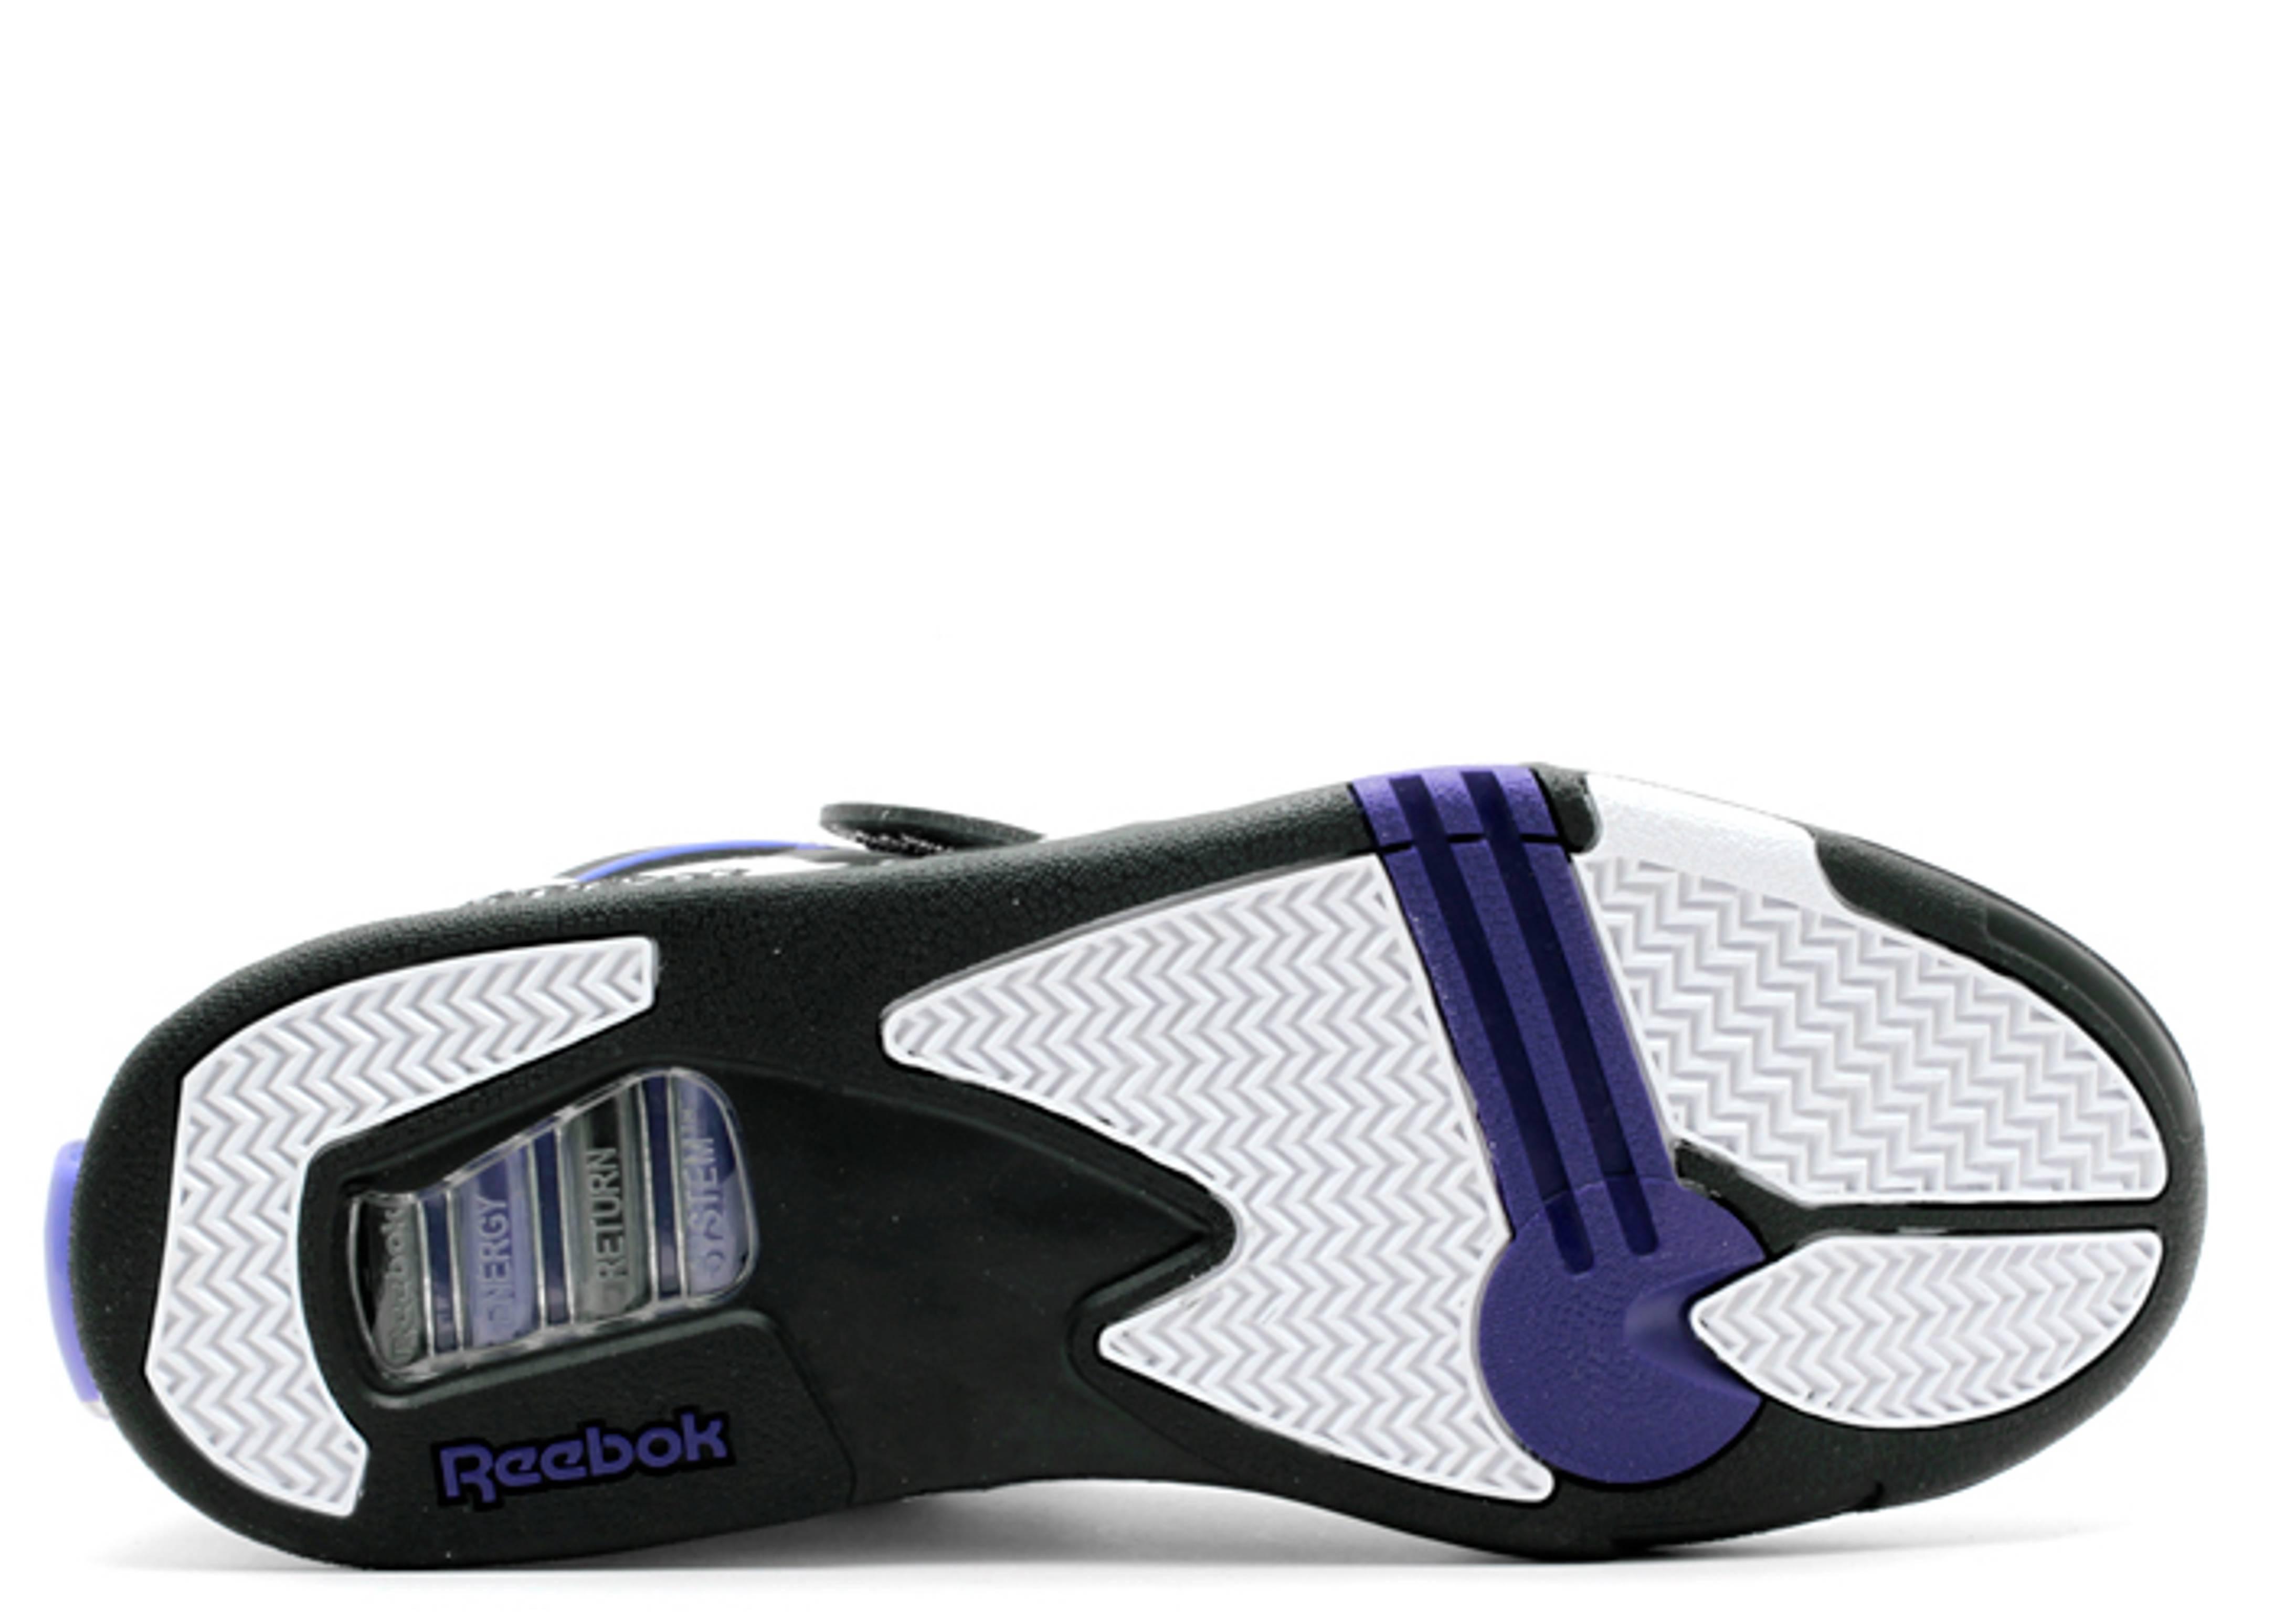 Pump Omni Zone - Reebok - j19441 - white team purple black  8cda8029c9